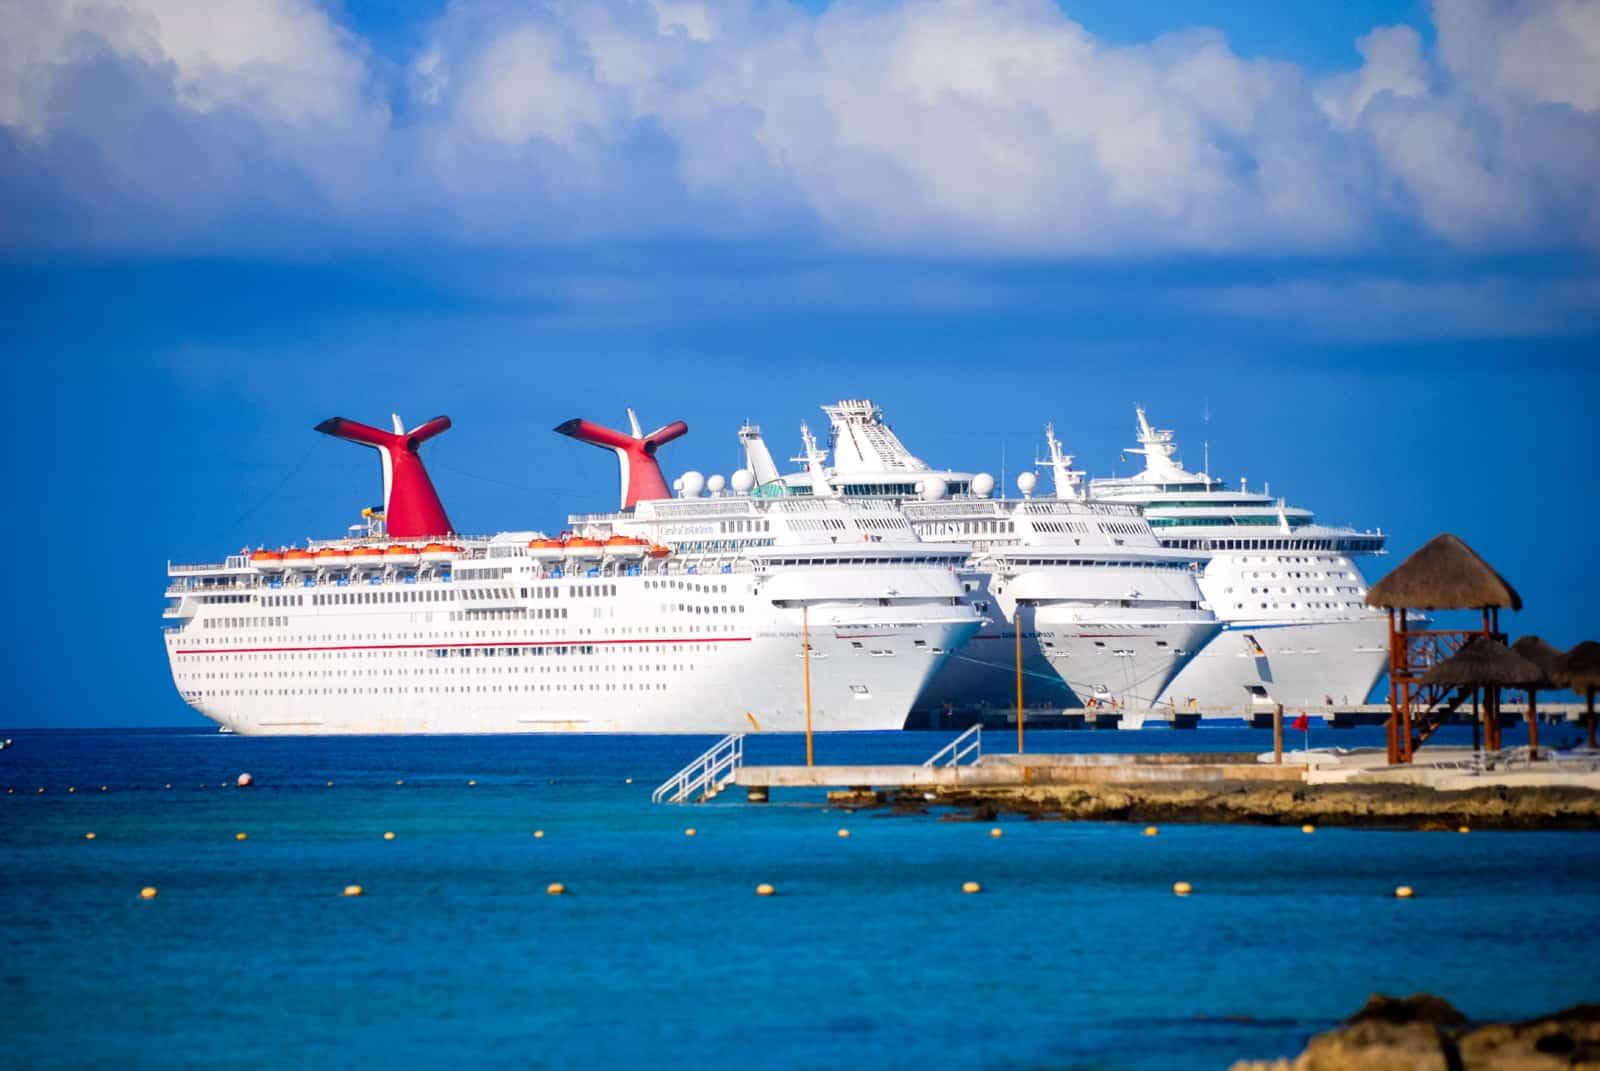 CozumelcruiseExcursions Cozumel Cruise Excursions - Cozumel cruise ship schedule